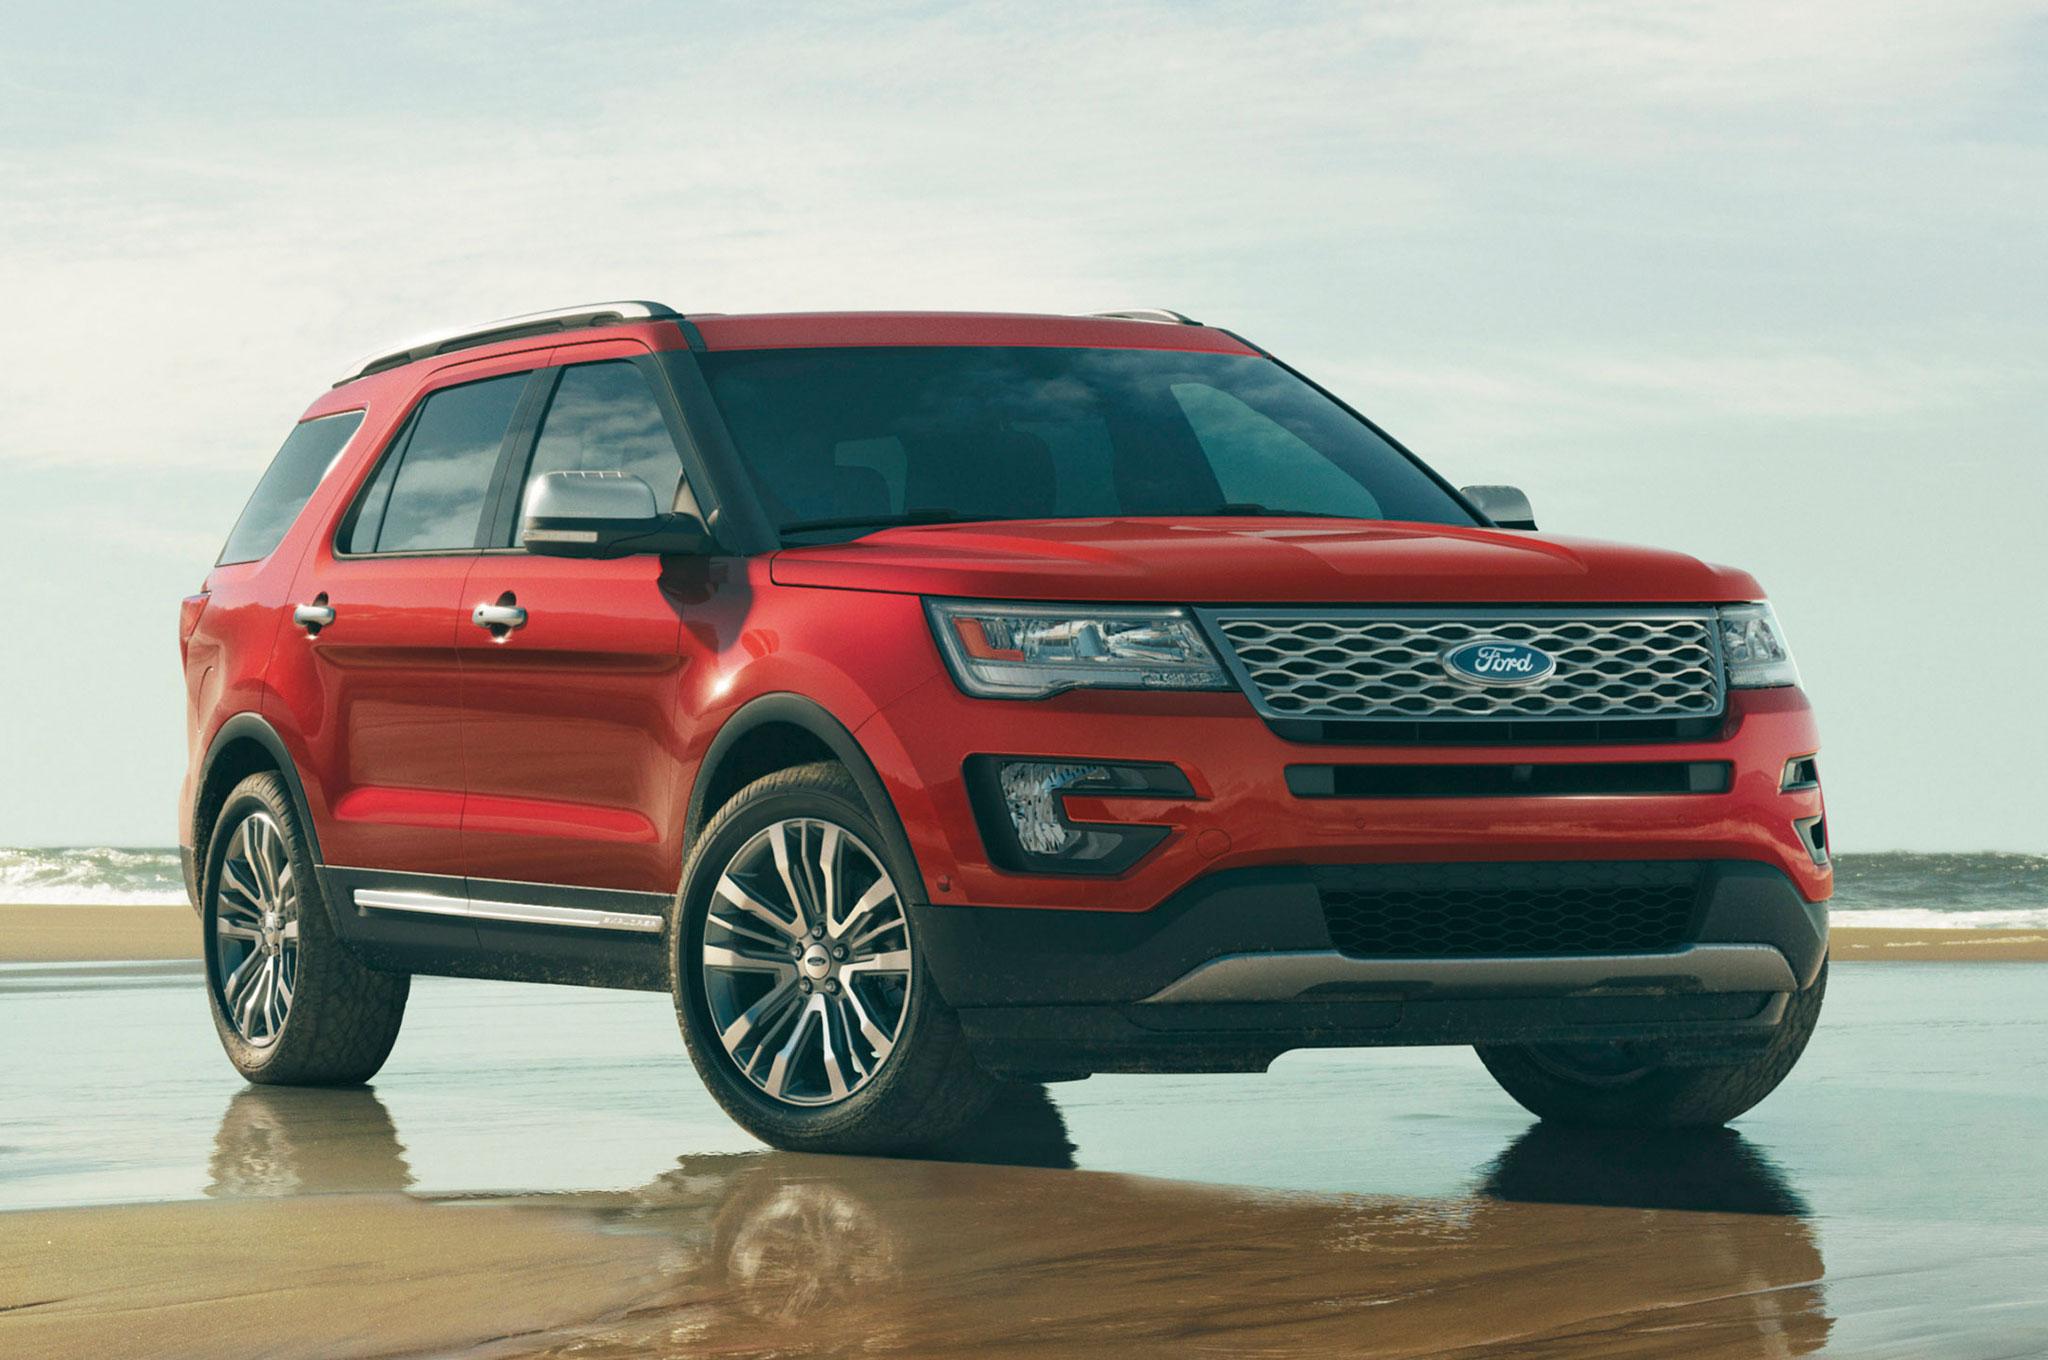 2016 Ford Explorer Front Three Quarter View 2